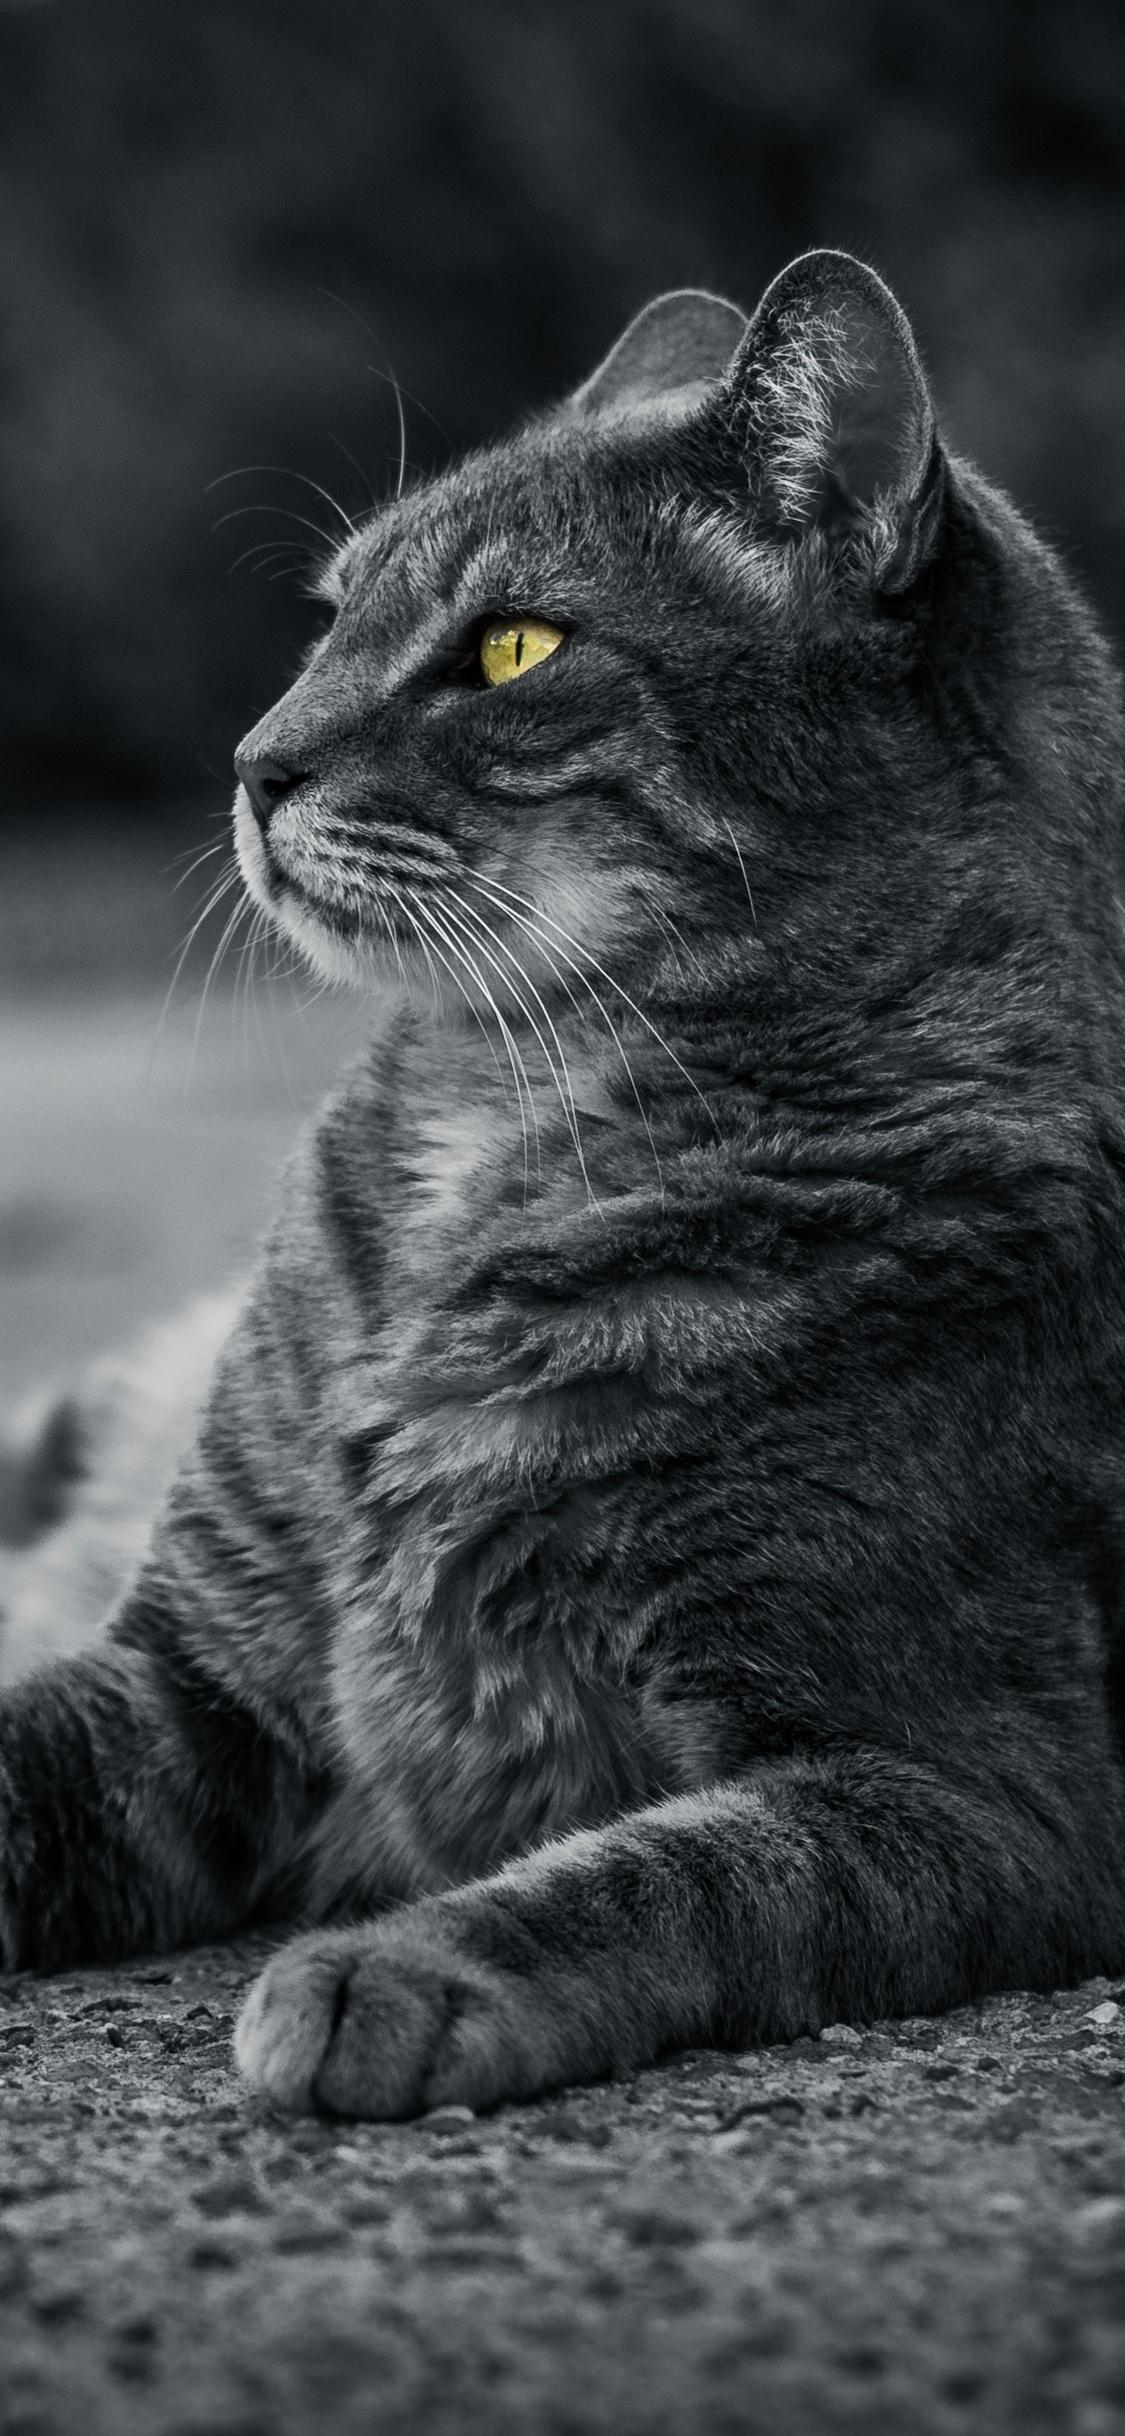 cat-monochrome-4k-67.jpg